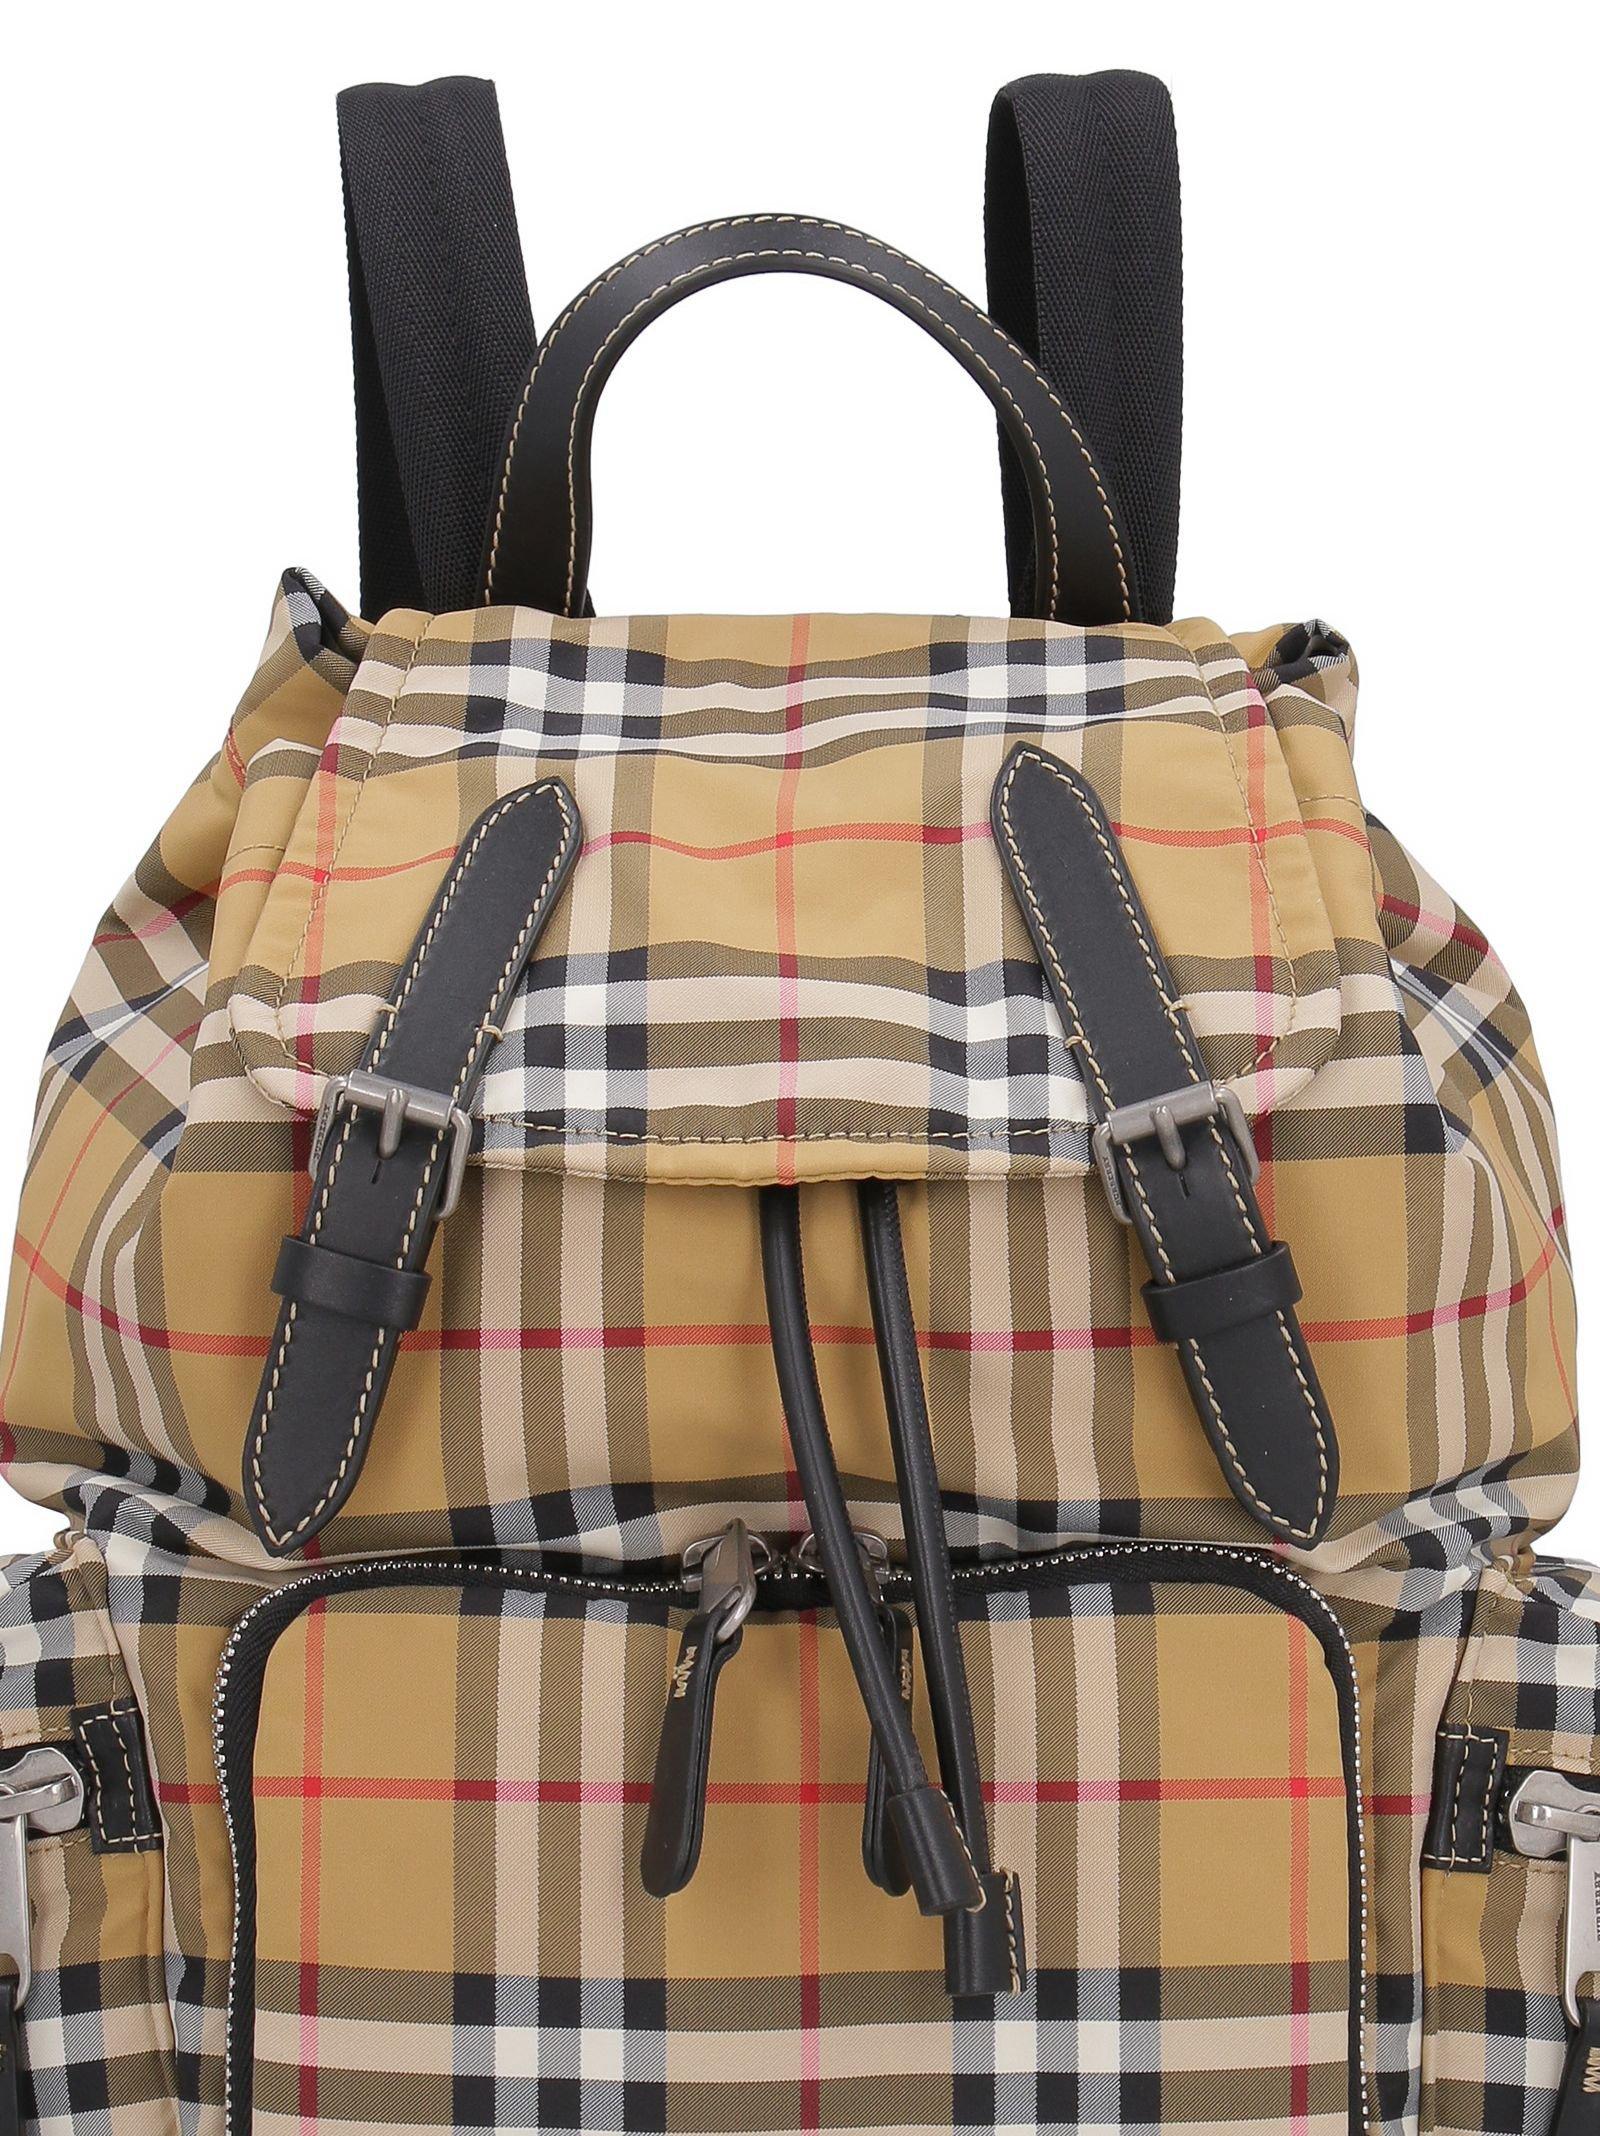 Burberry The Rucksack Medium Nylon Backpack